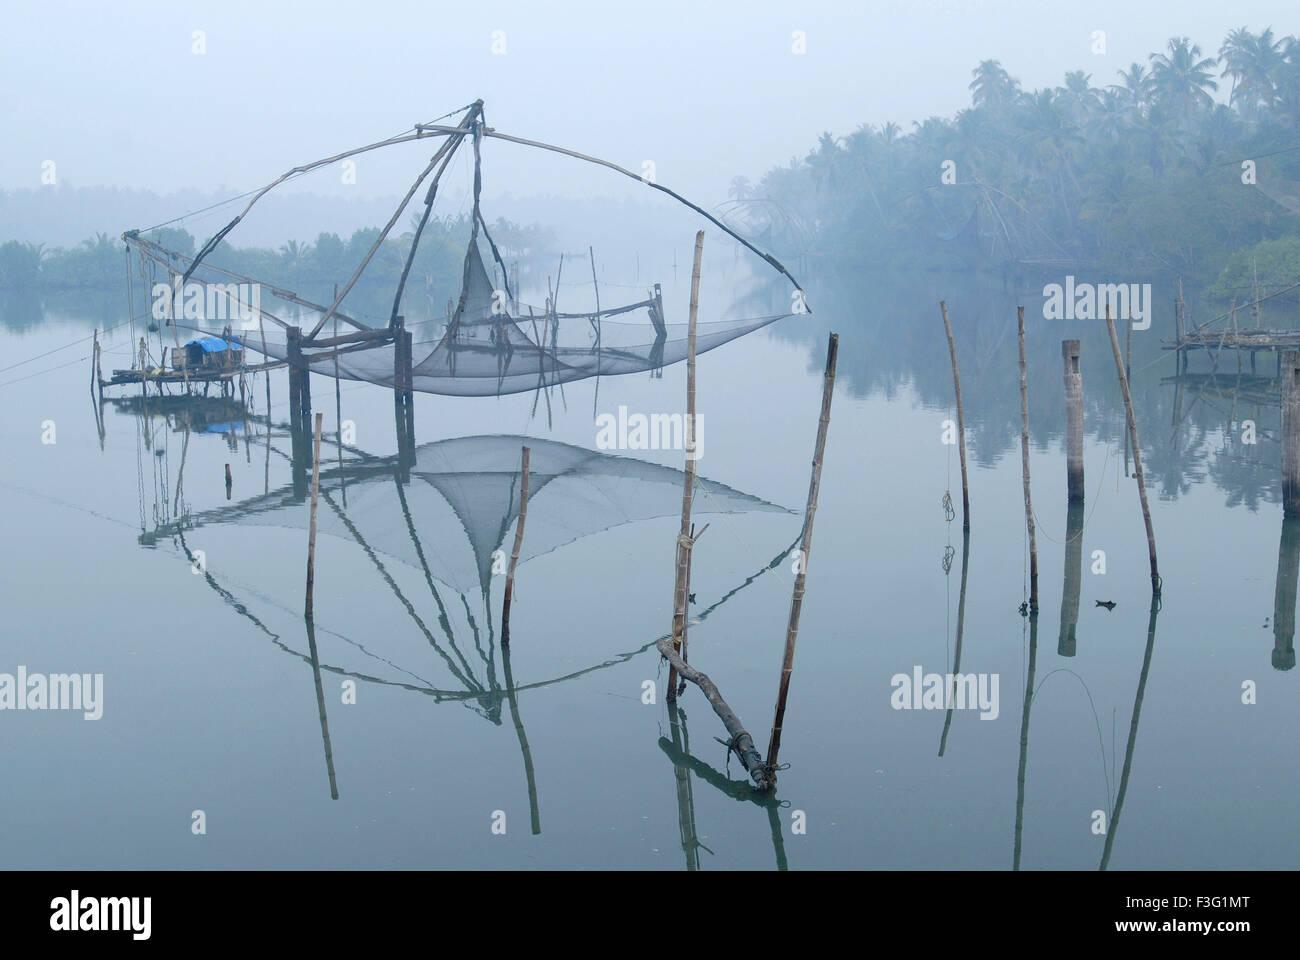 The Chinese fishing net ; cheena vala fishing technique ; cochin kochin ; kerala ; India - Stock Image